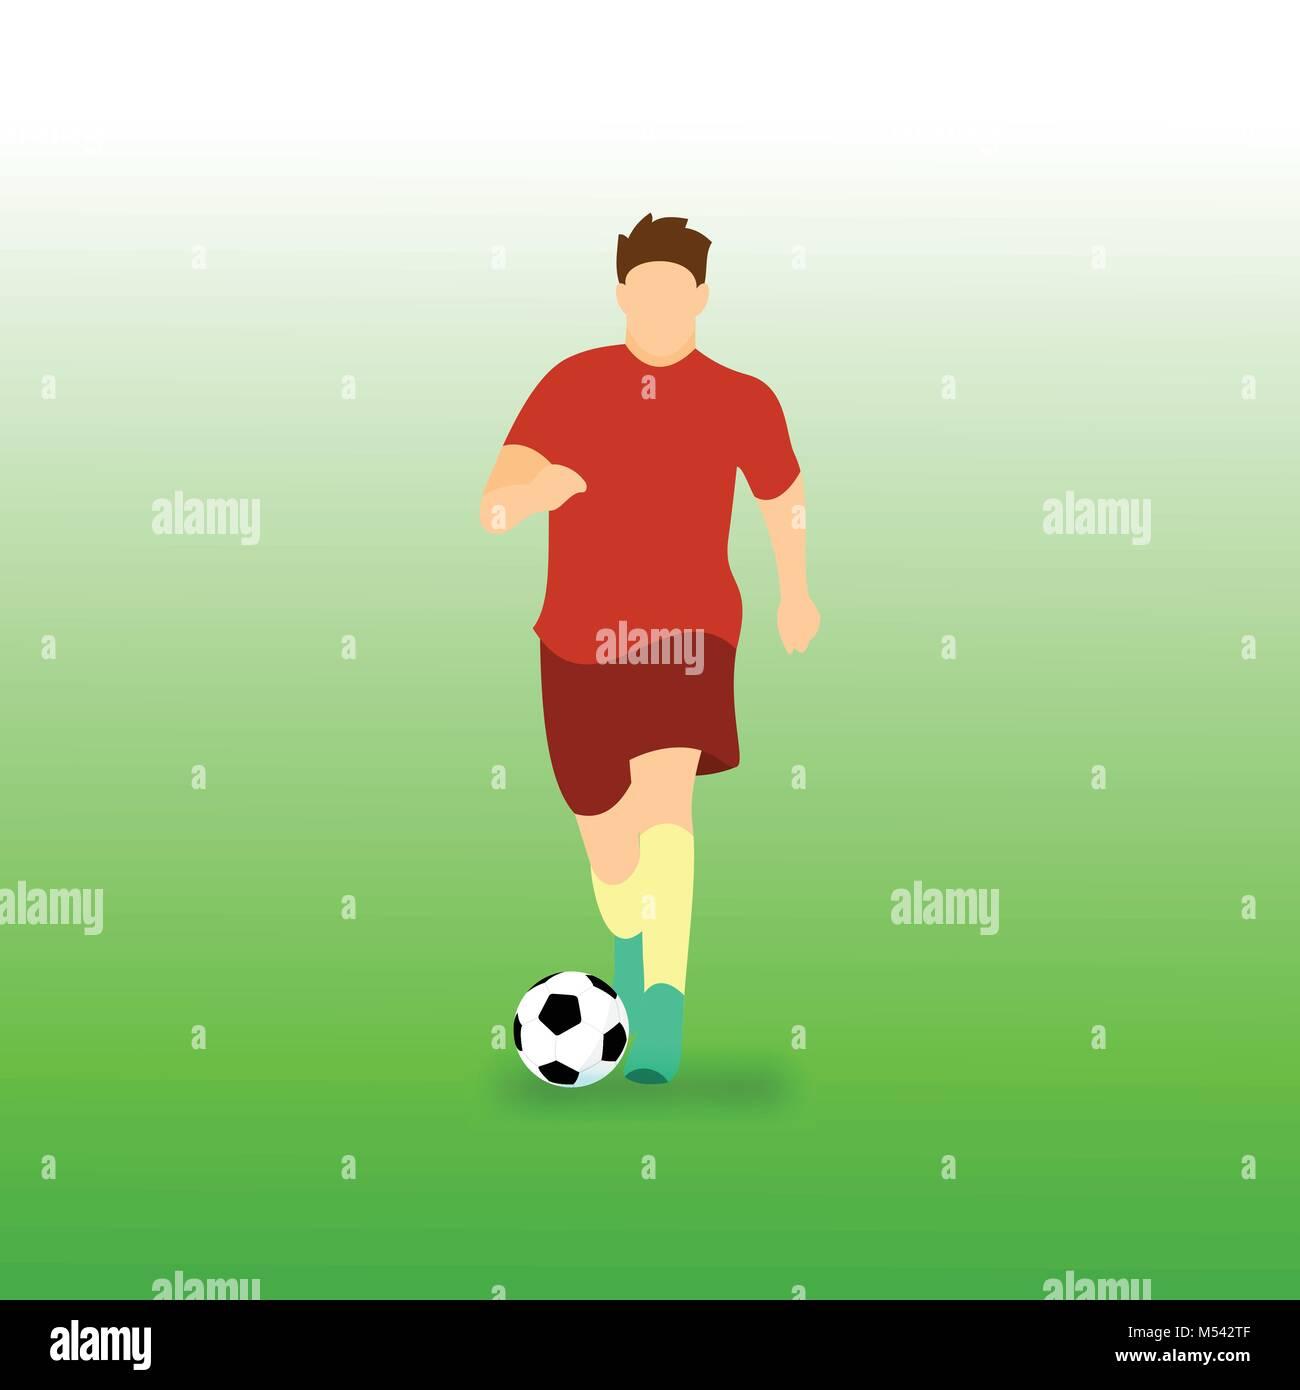 Dribbling Ball Football Soccer Player Vector Illustration Graphic Design - Stock Vector